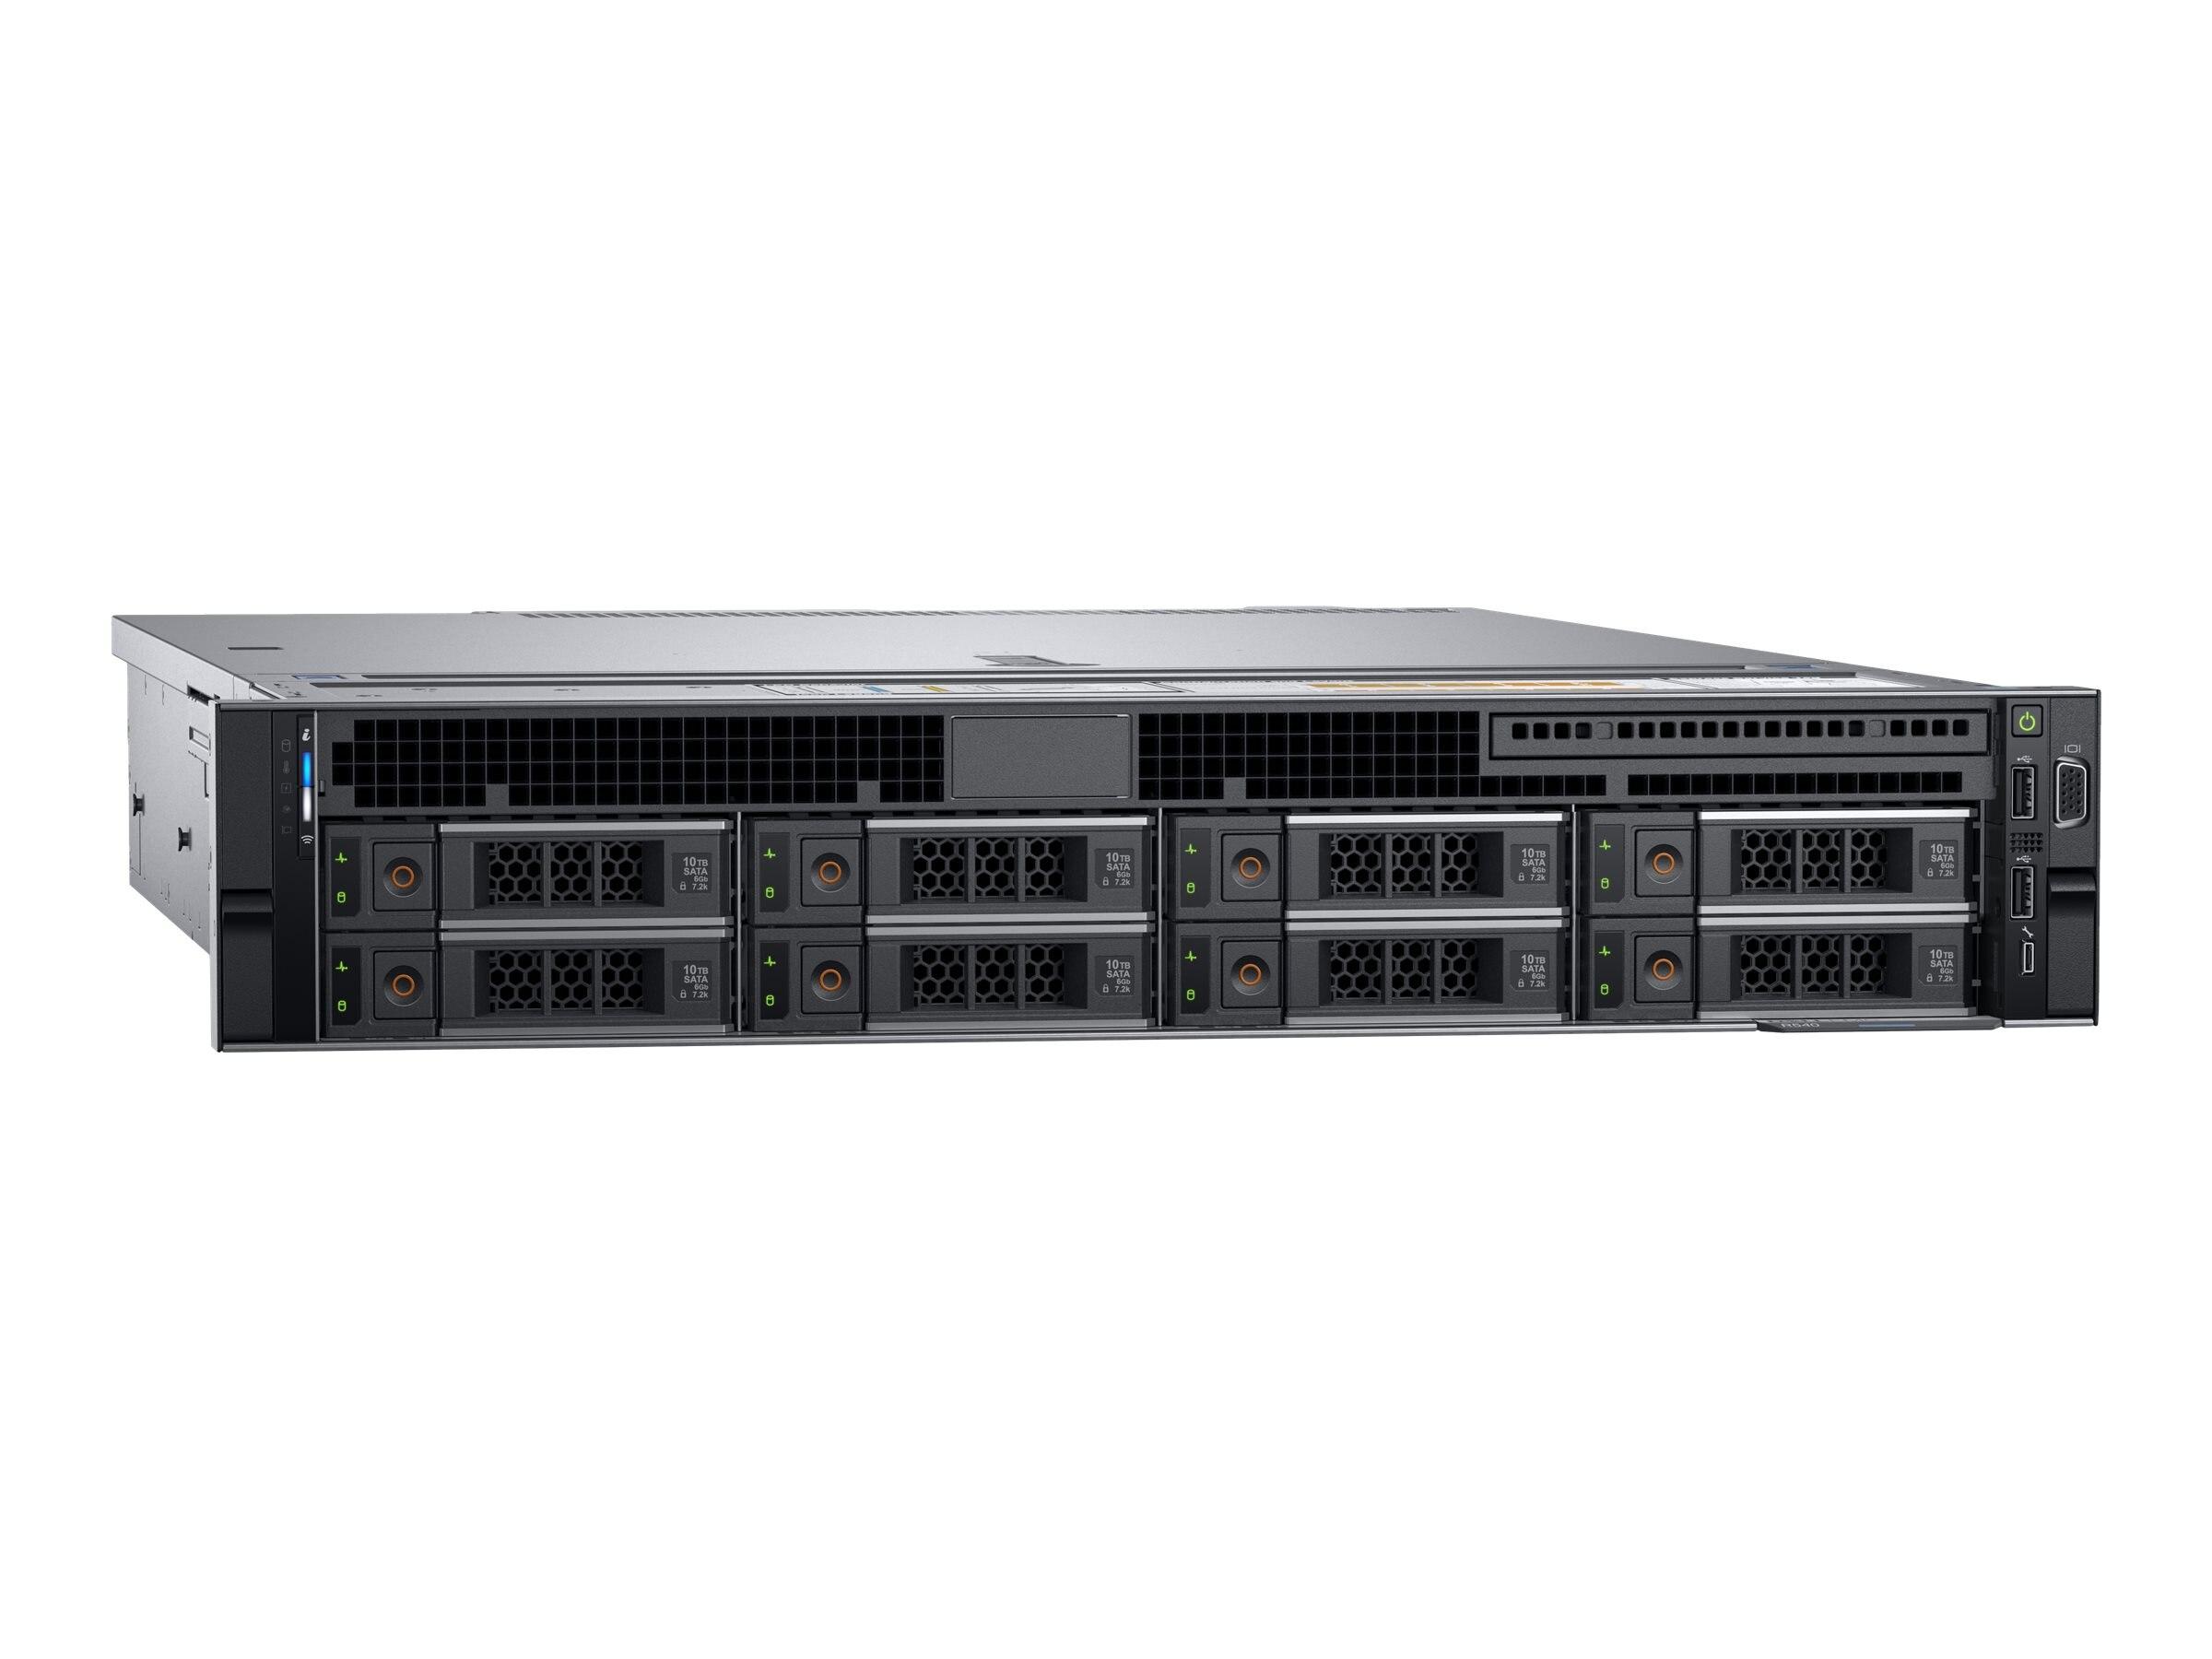 Dell PowerEdge R540 Intel 2 1GHz Xeon Silver